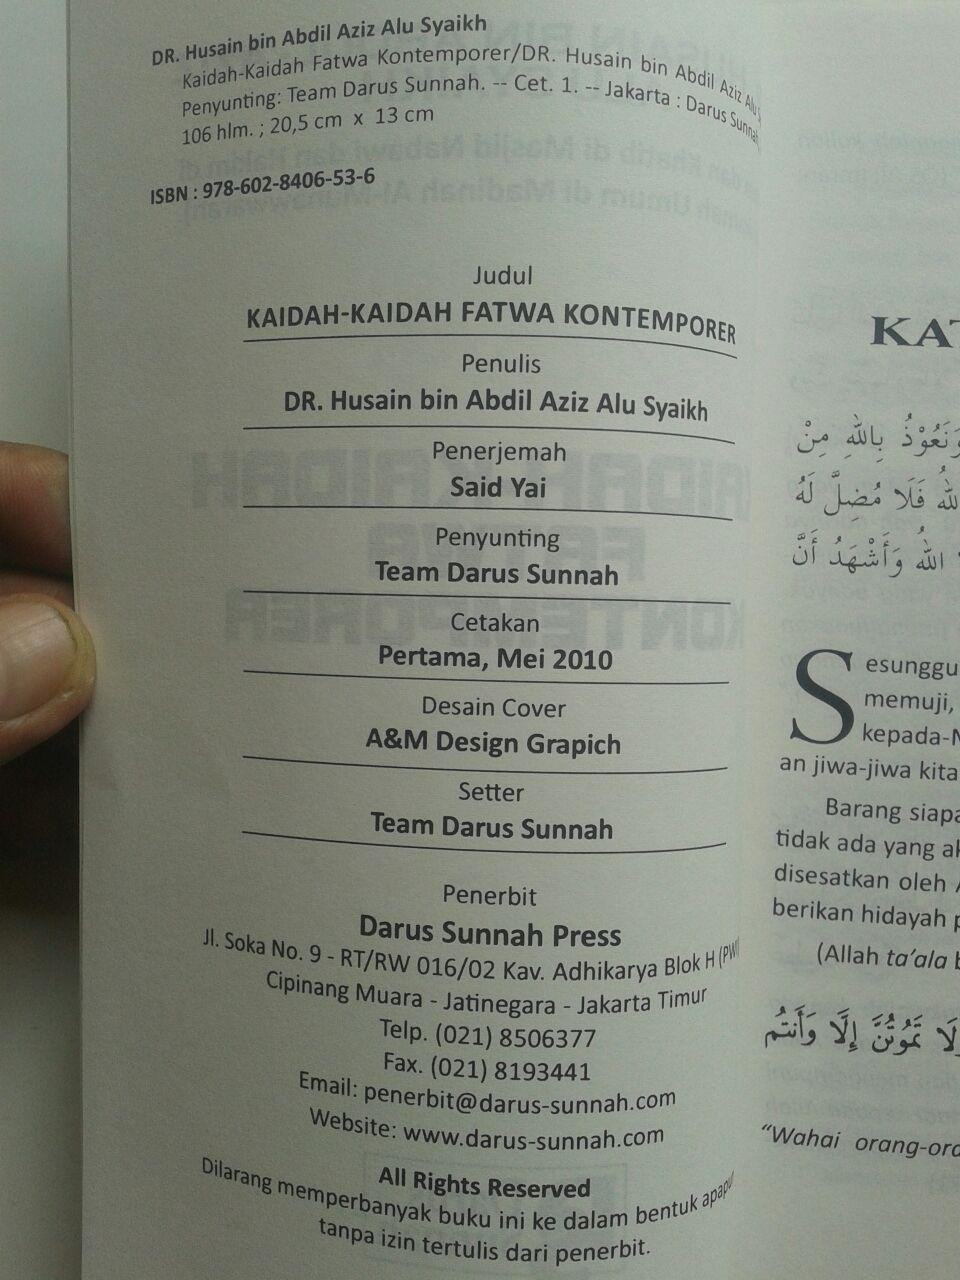 Buku Kaidah-Kaidah Fatwa Kontemporer 19.000 15% 16.150 Darus Sunnah DR. Husain Bin Abdul Aziz Alu Syaikh isi